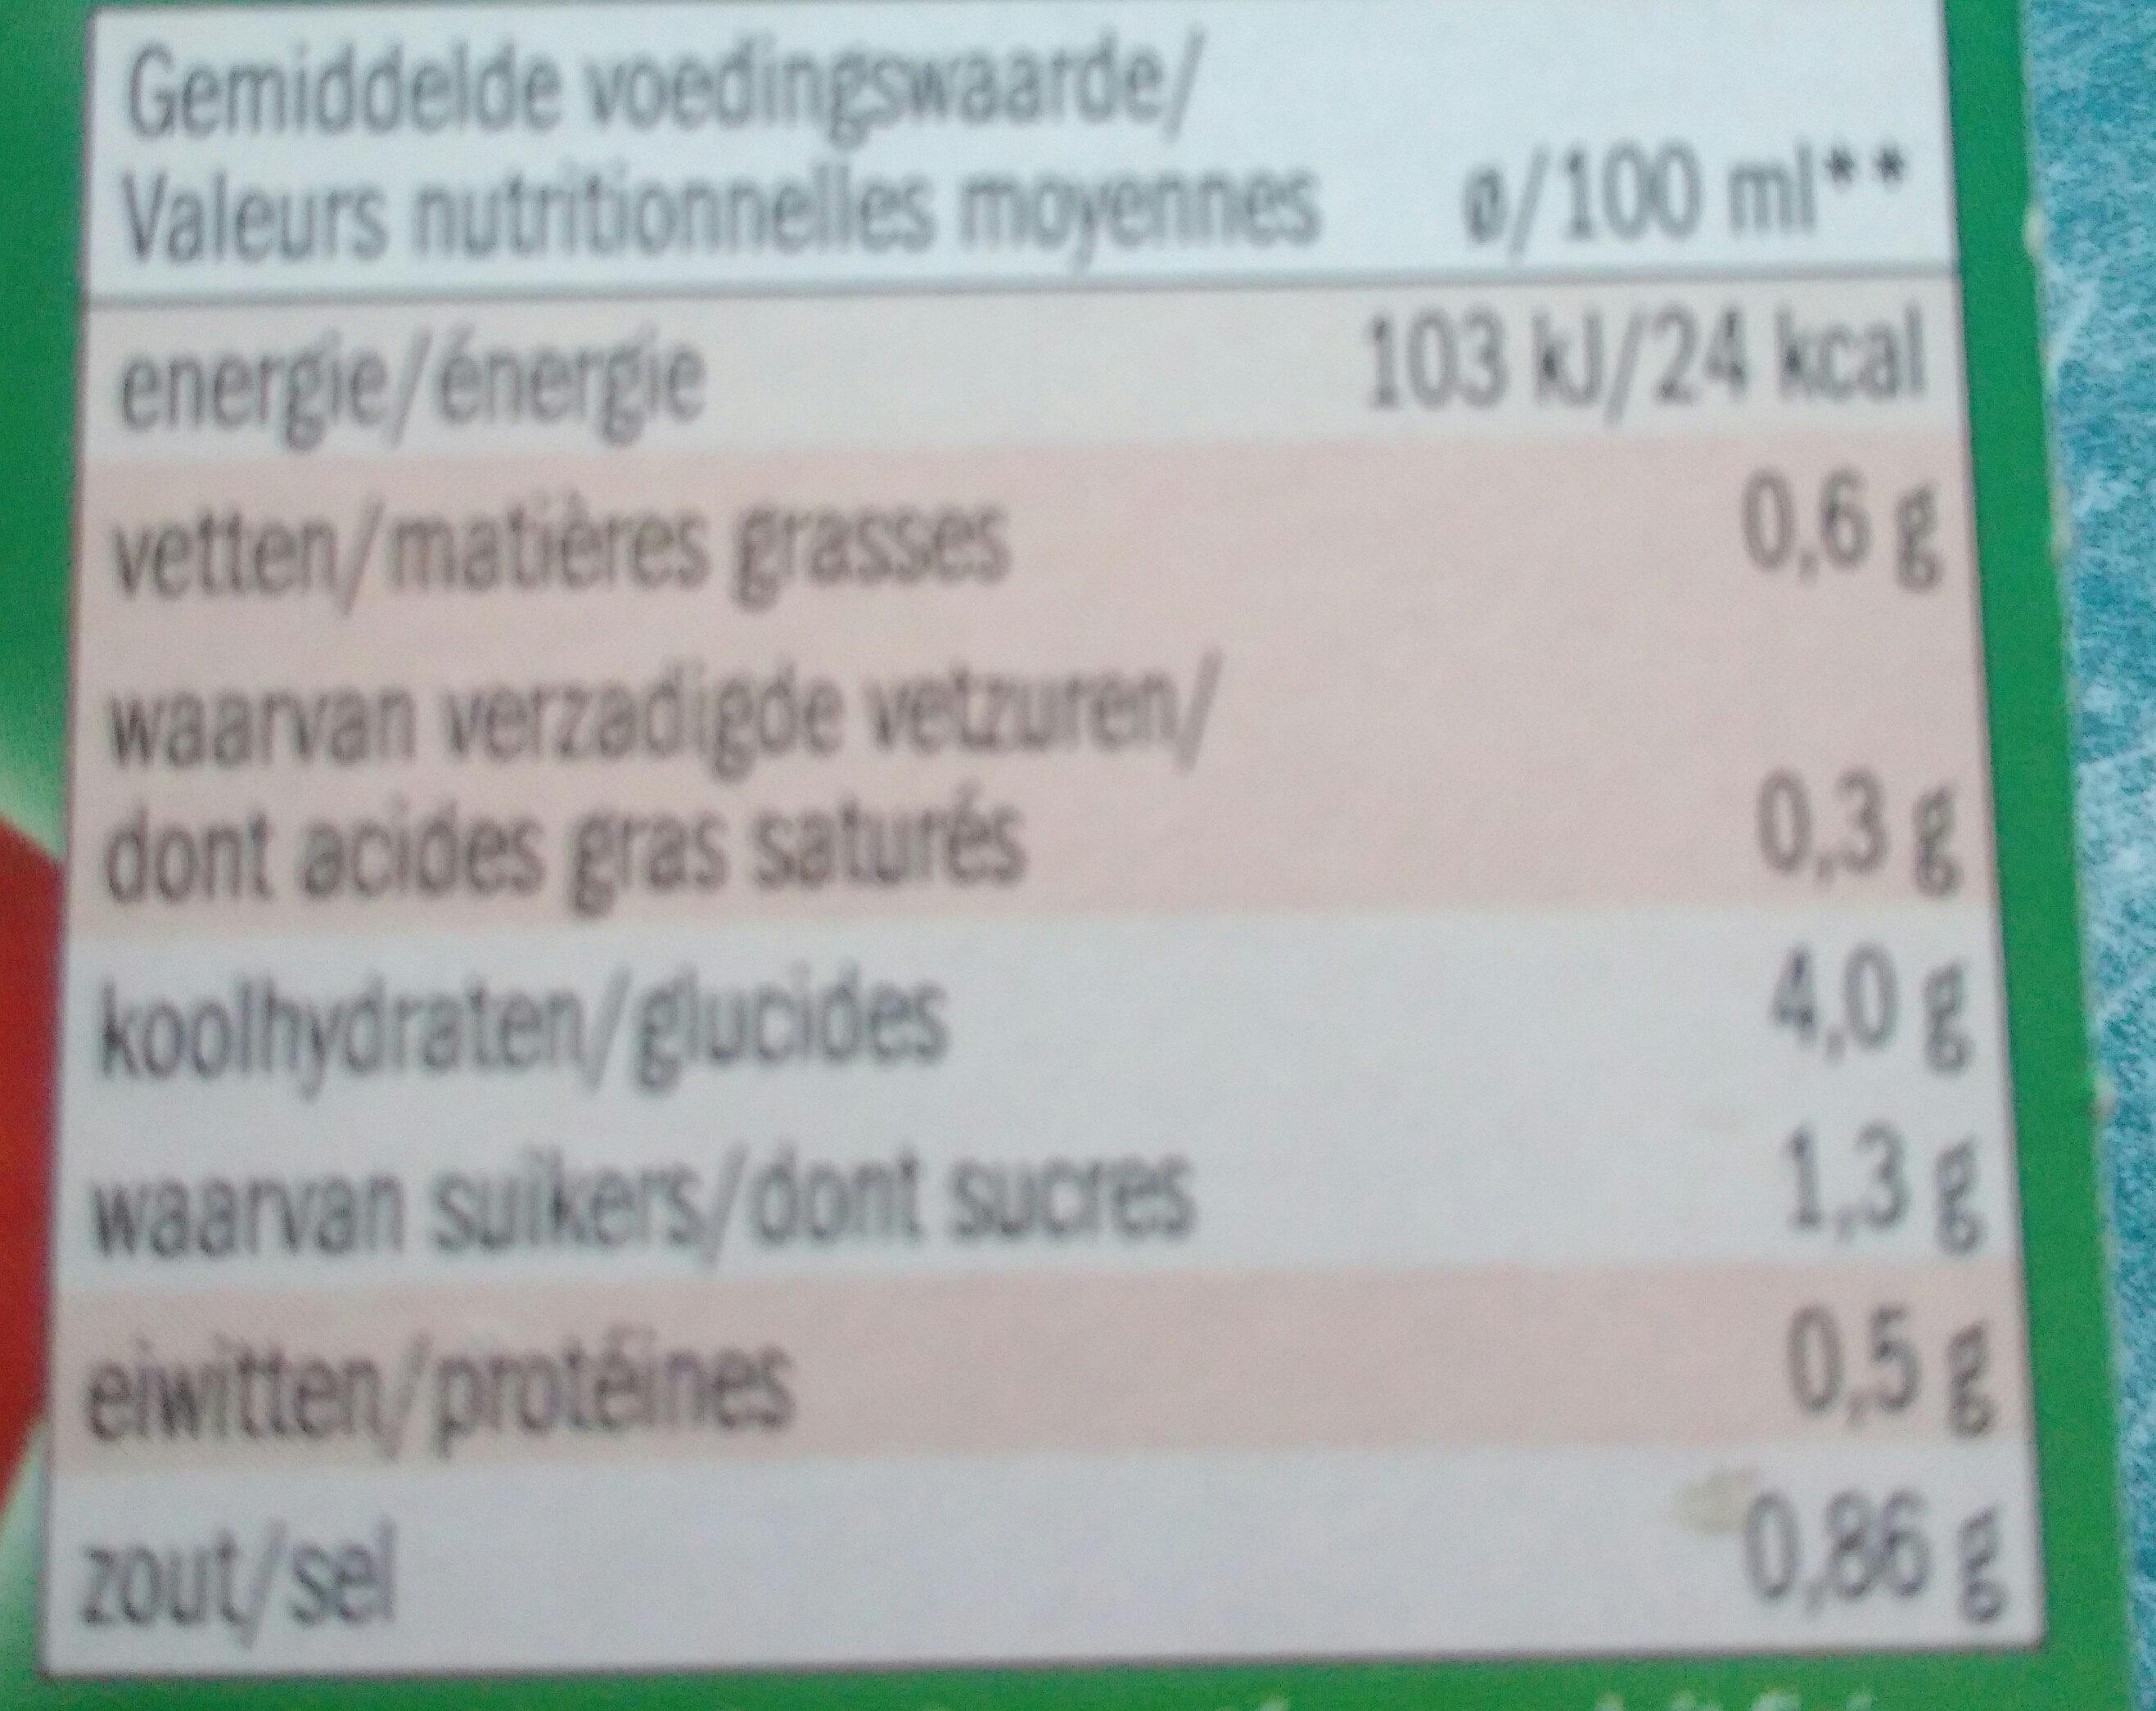 Soupe a la tomate - Voedingswaarden - fr